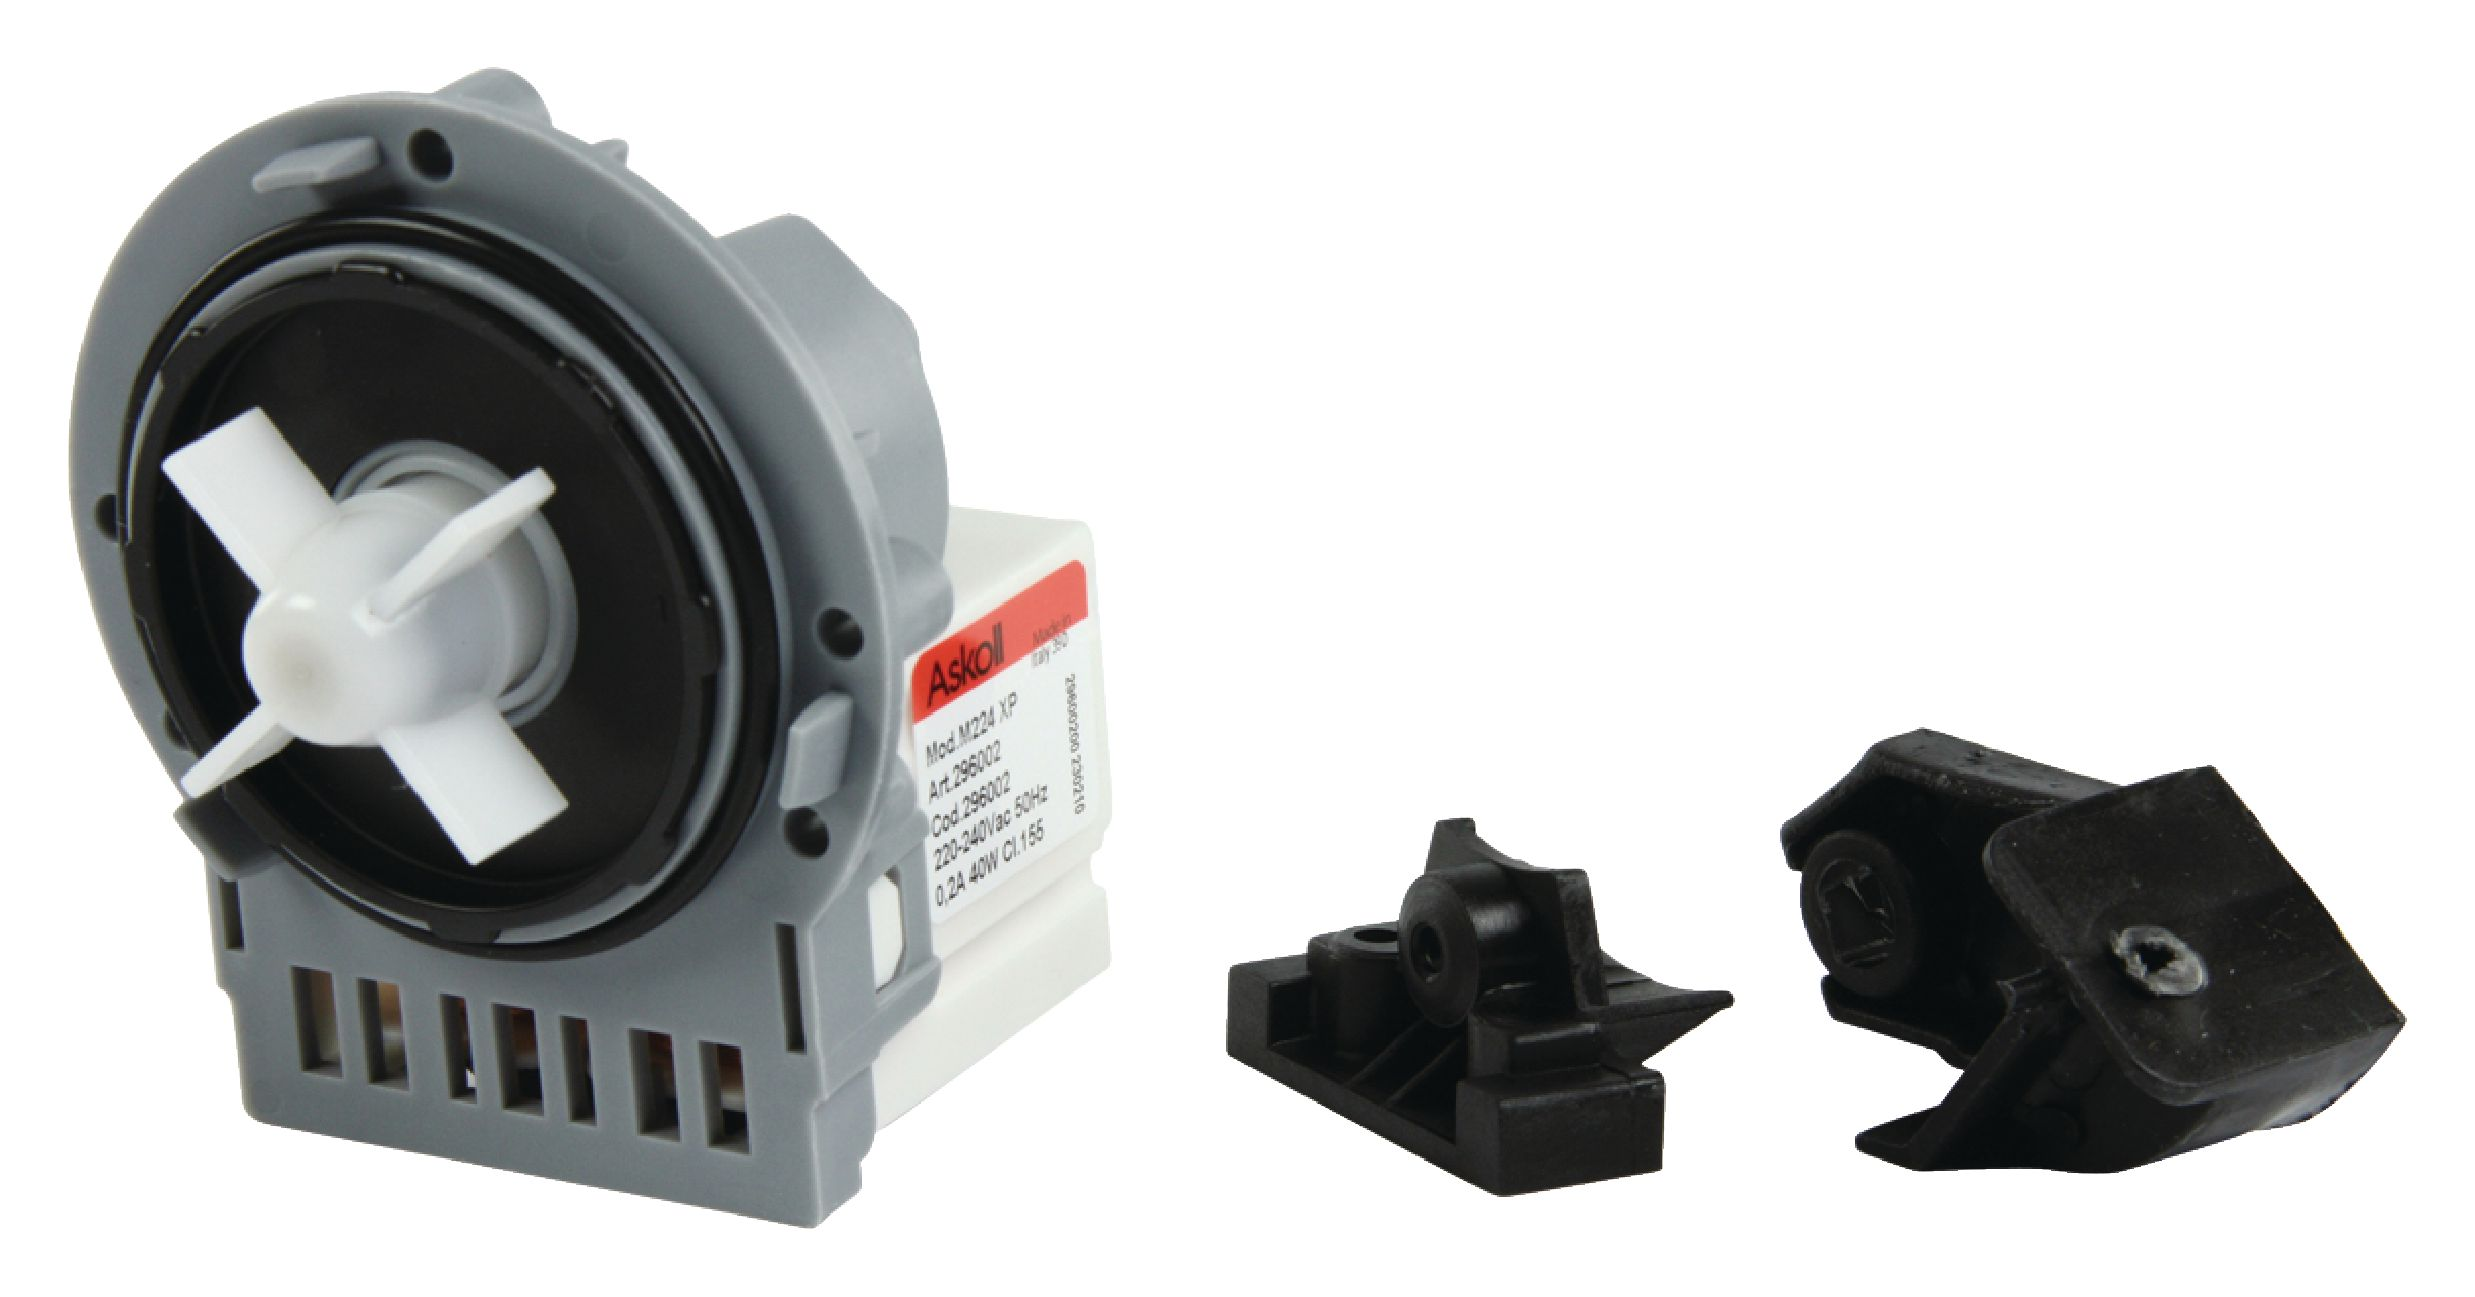 Čerpadlo pro pračky Whirpool, Bosch, Siemens, Zanussi 290903, 63AB900